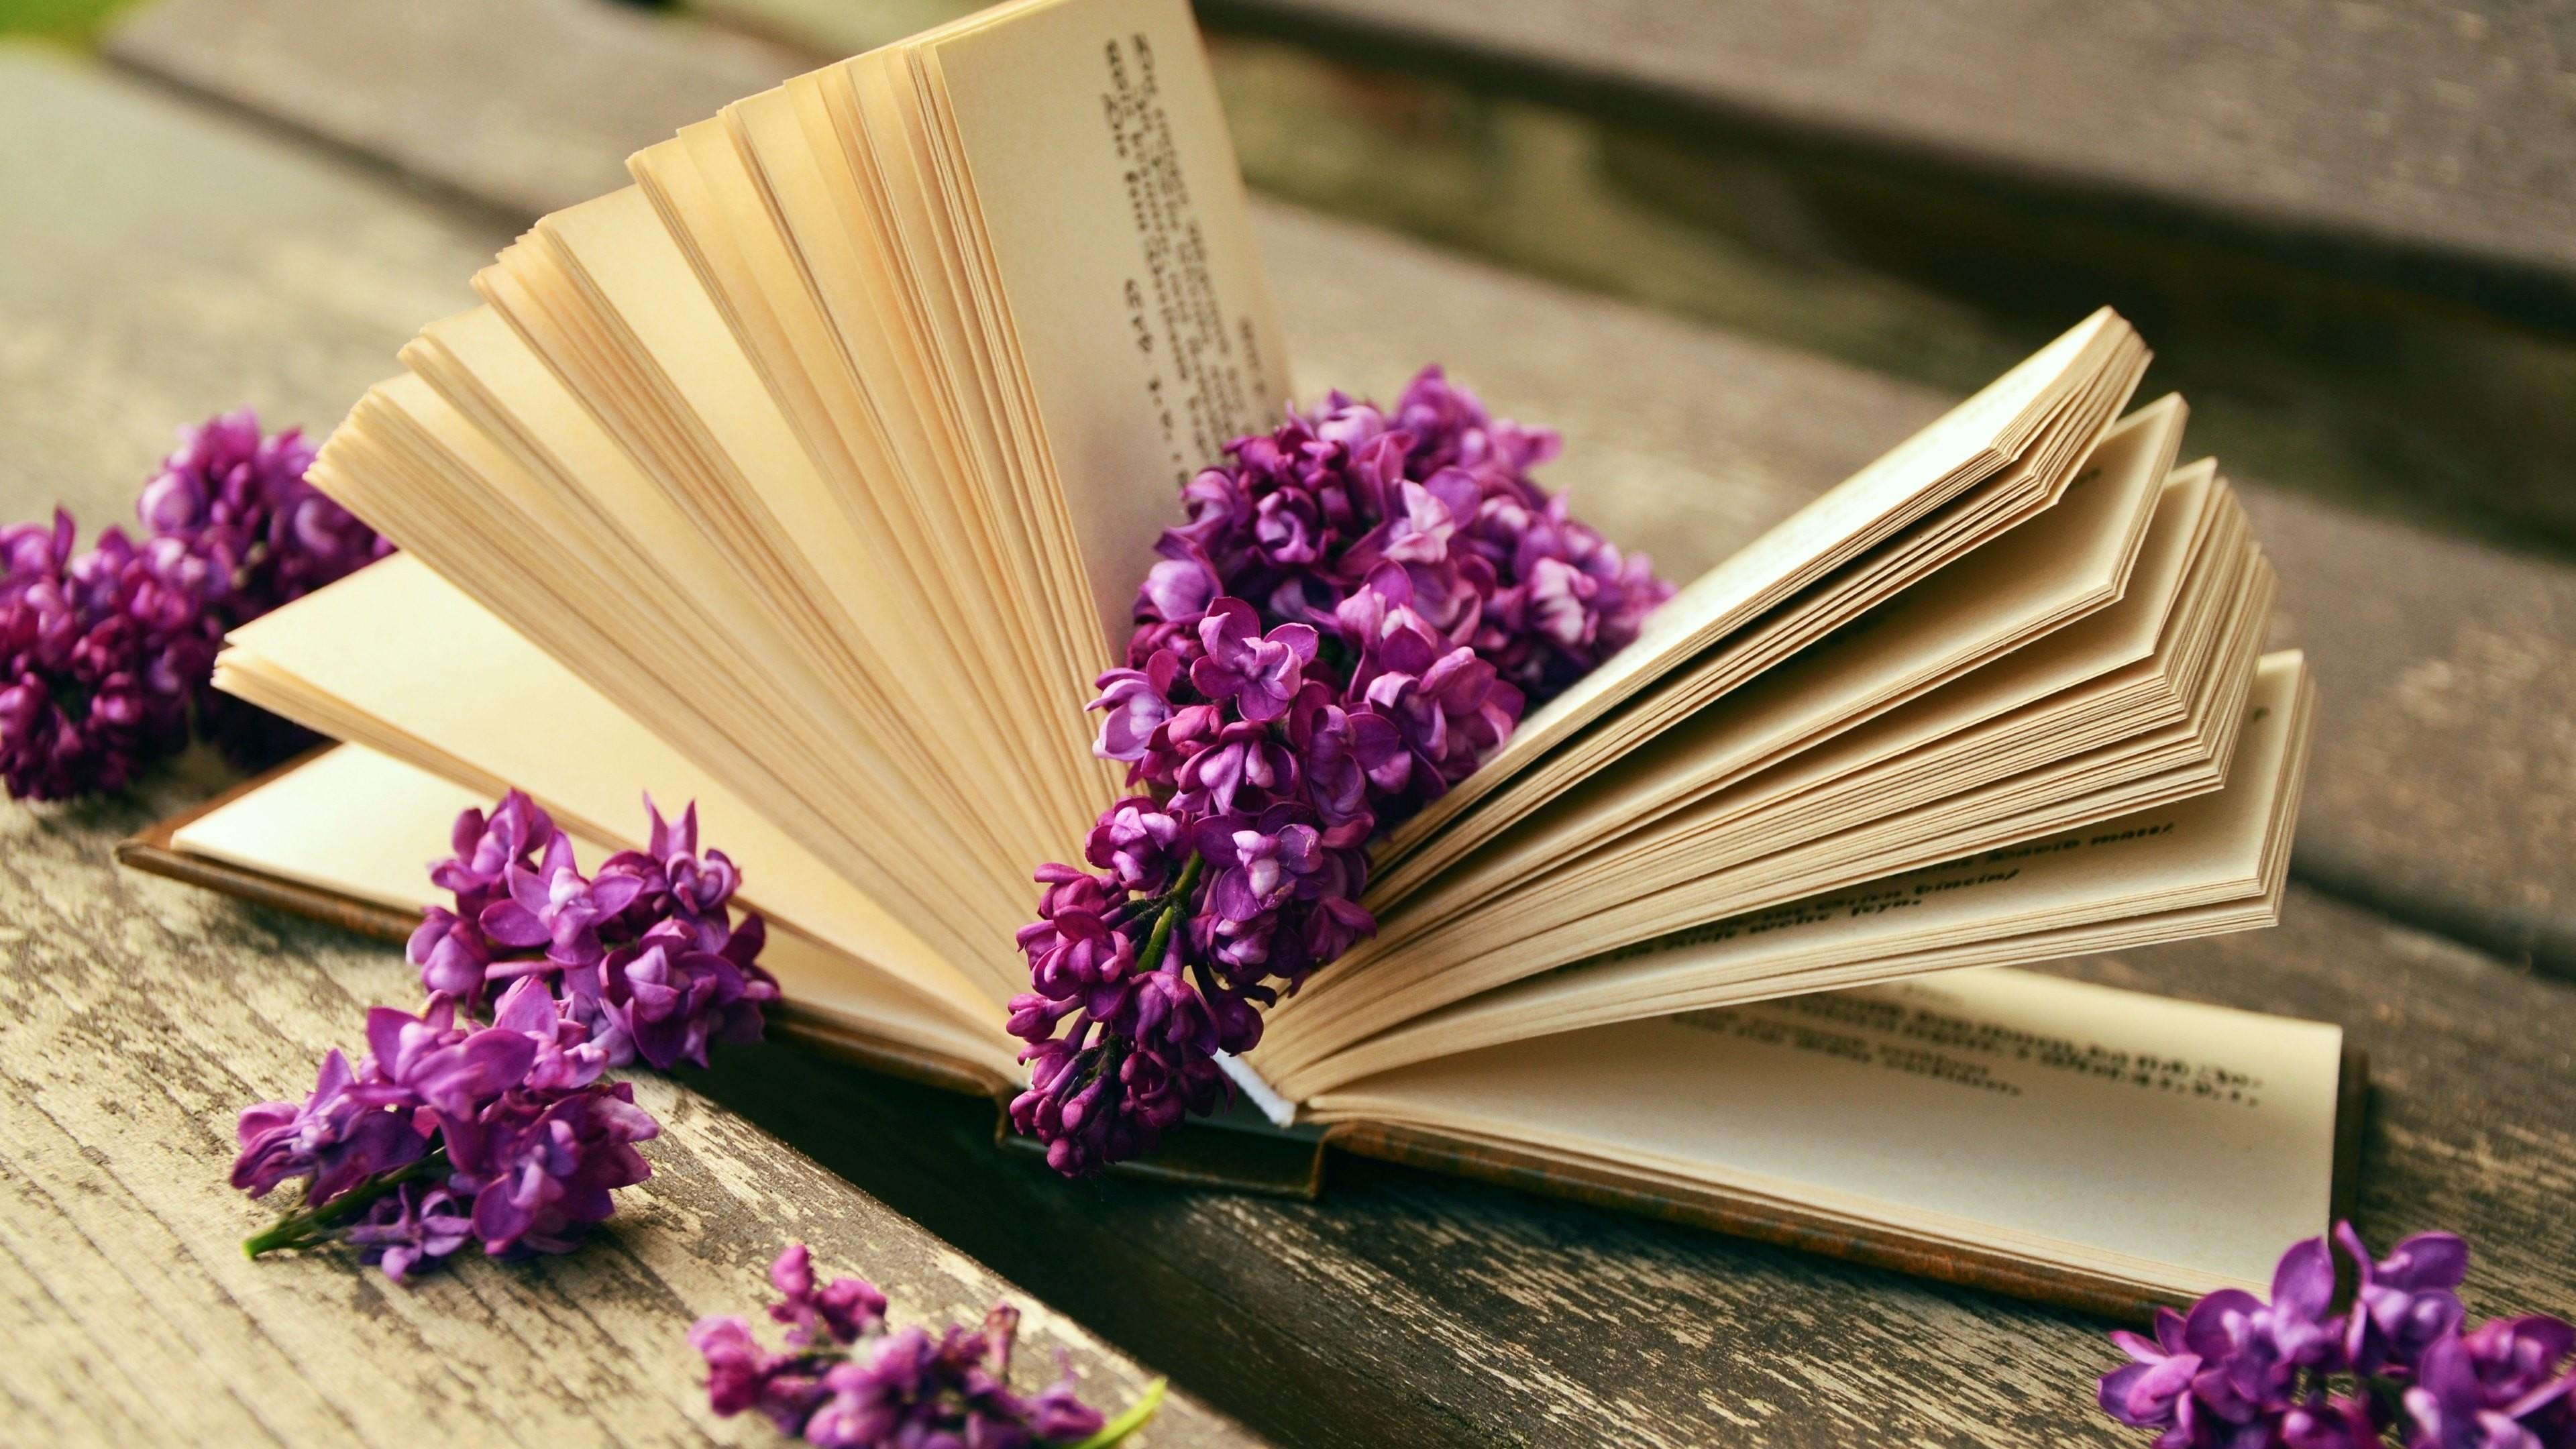 Man Made – Book Lilac Flower Still Life Wallpaper